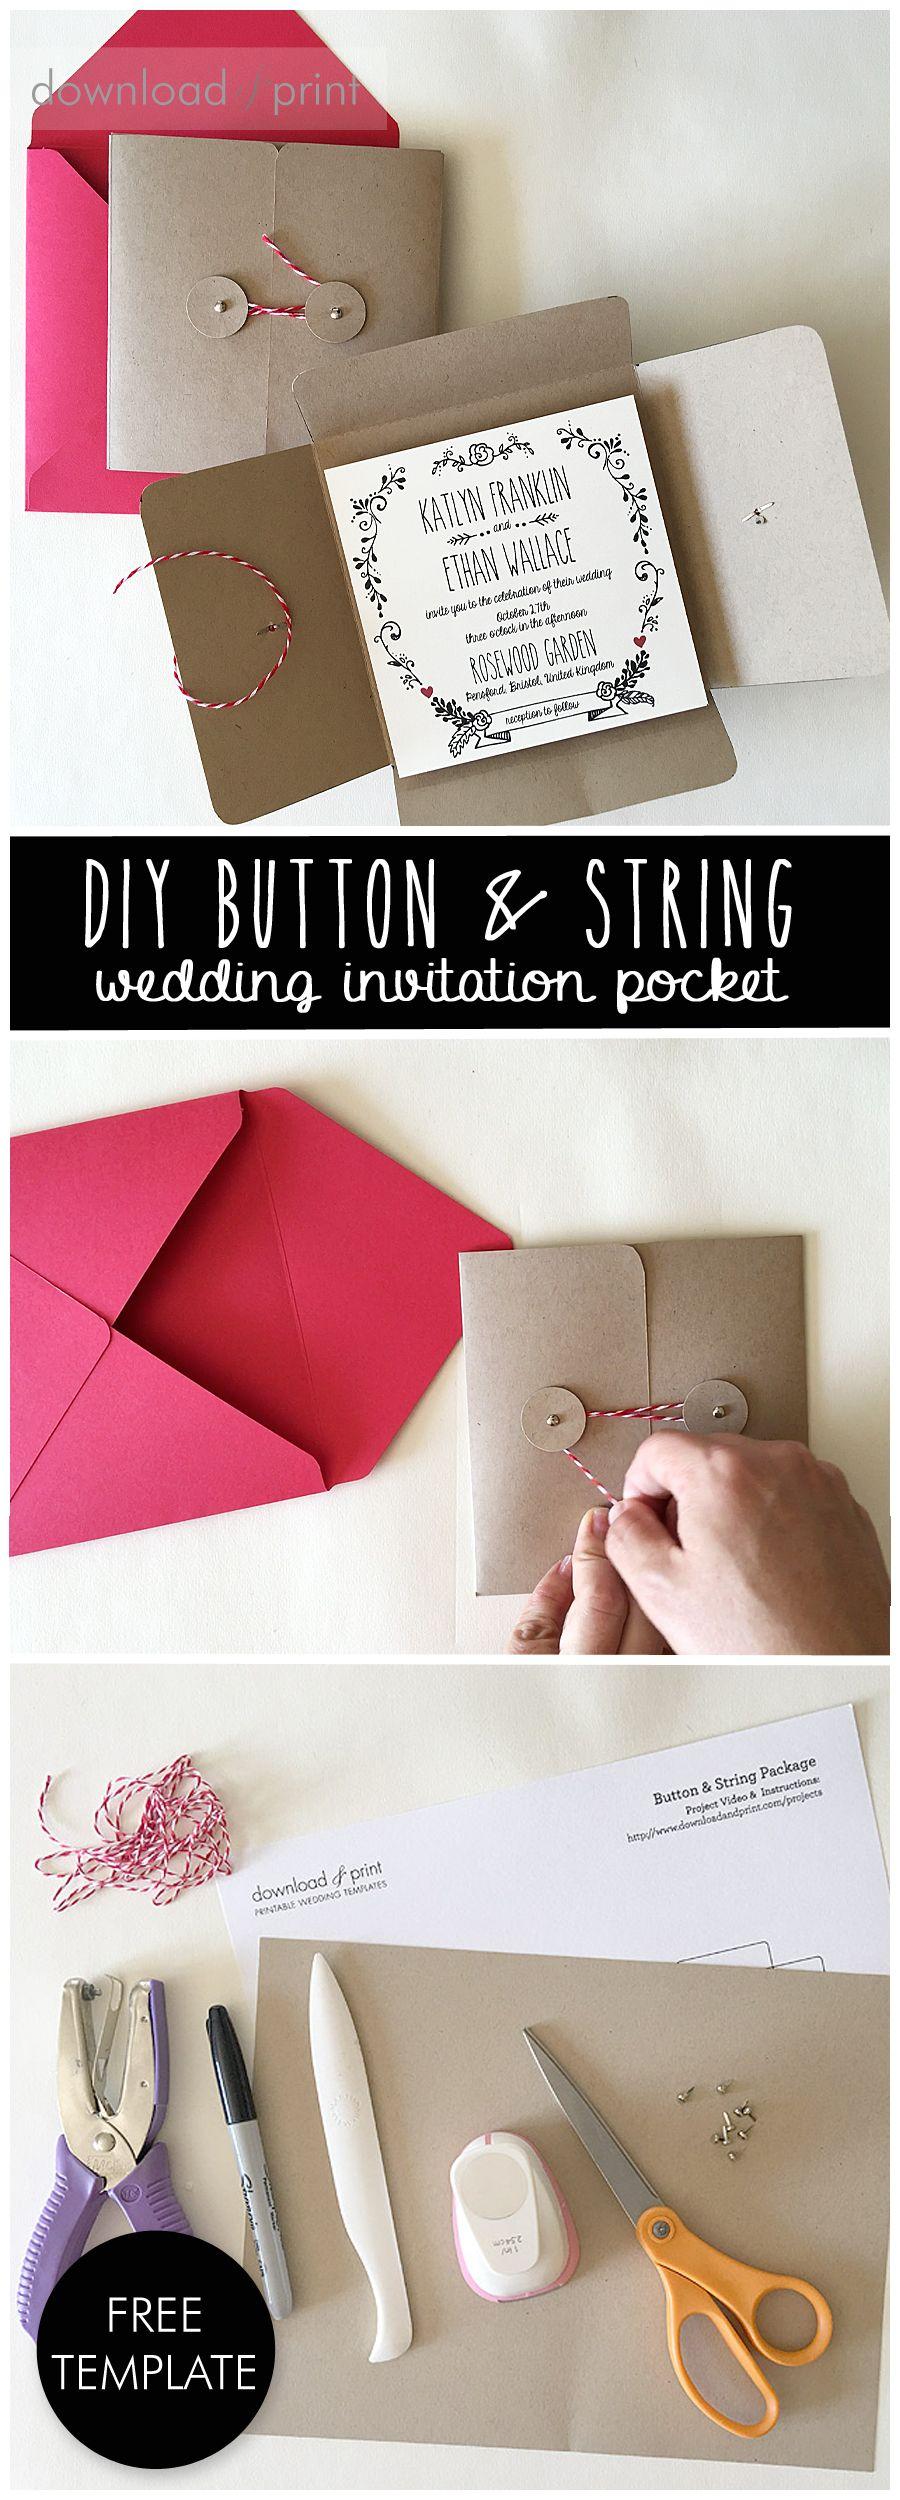 Create a wedding invitation pocket from a regular 8.5 x 11\